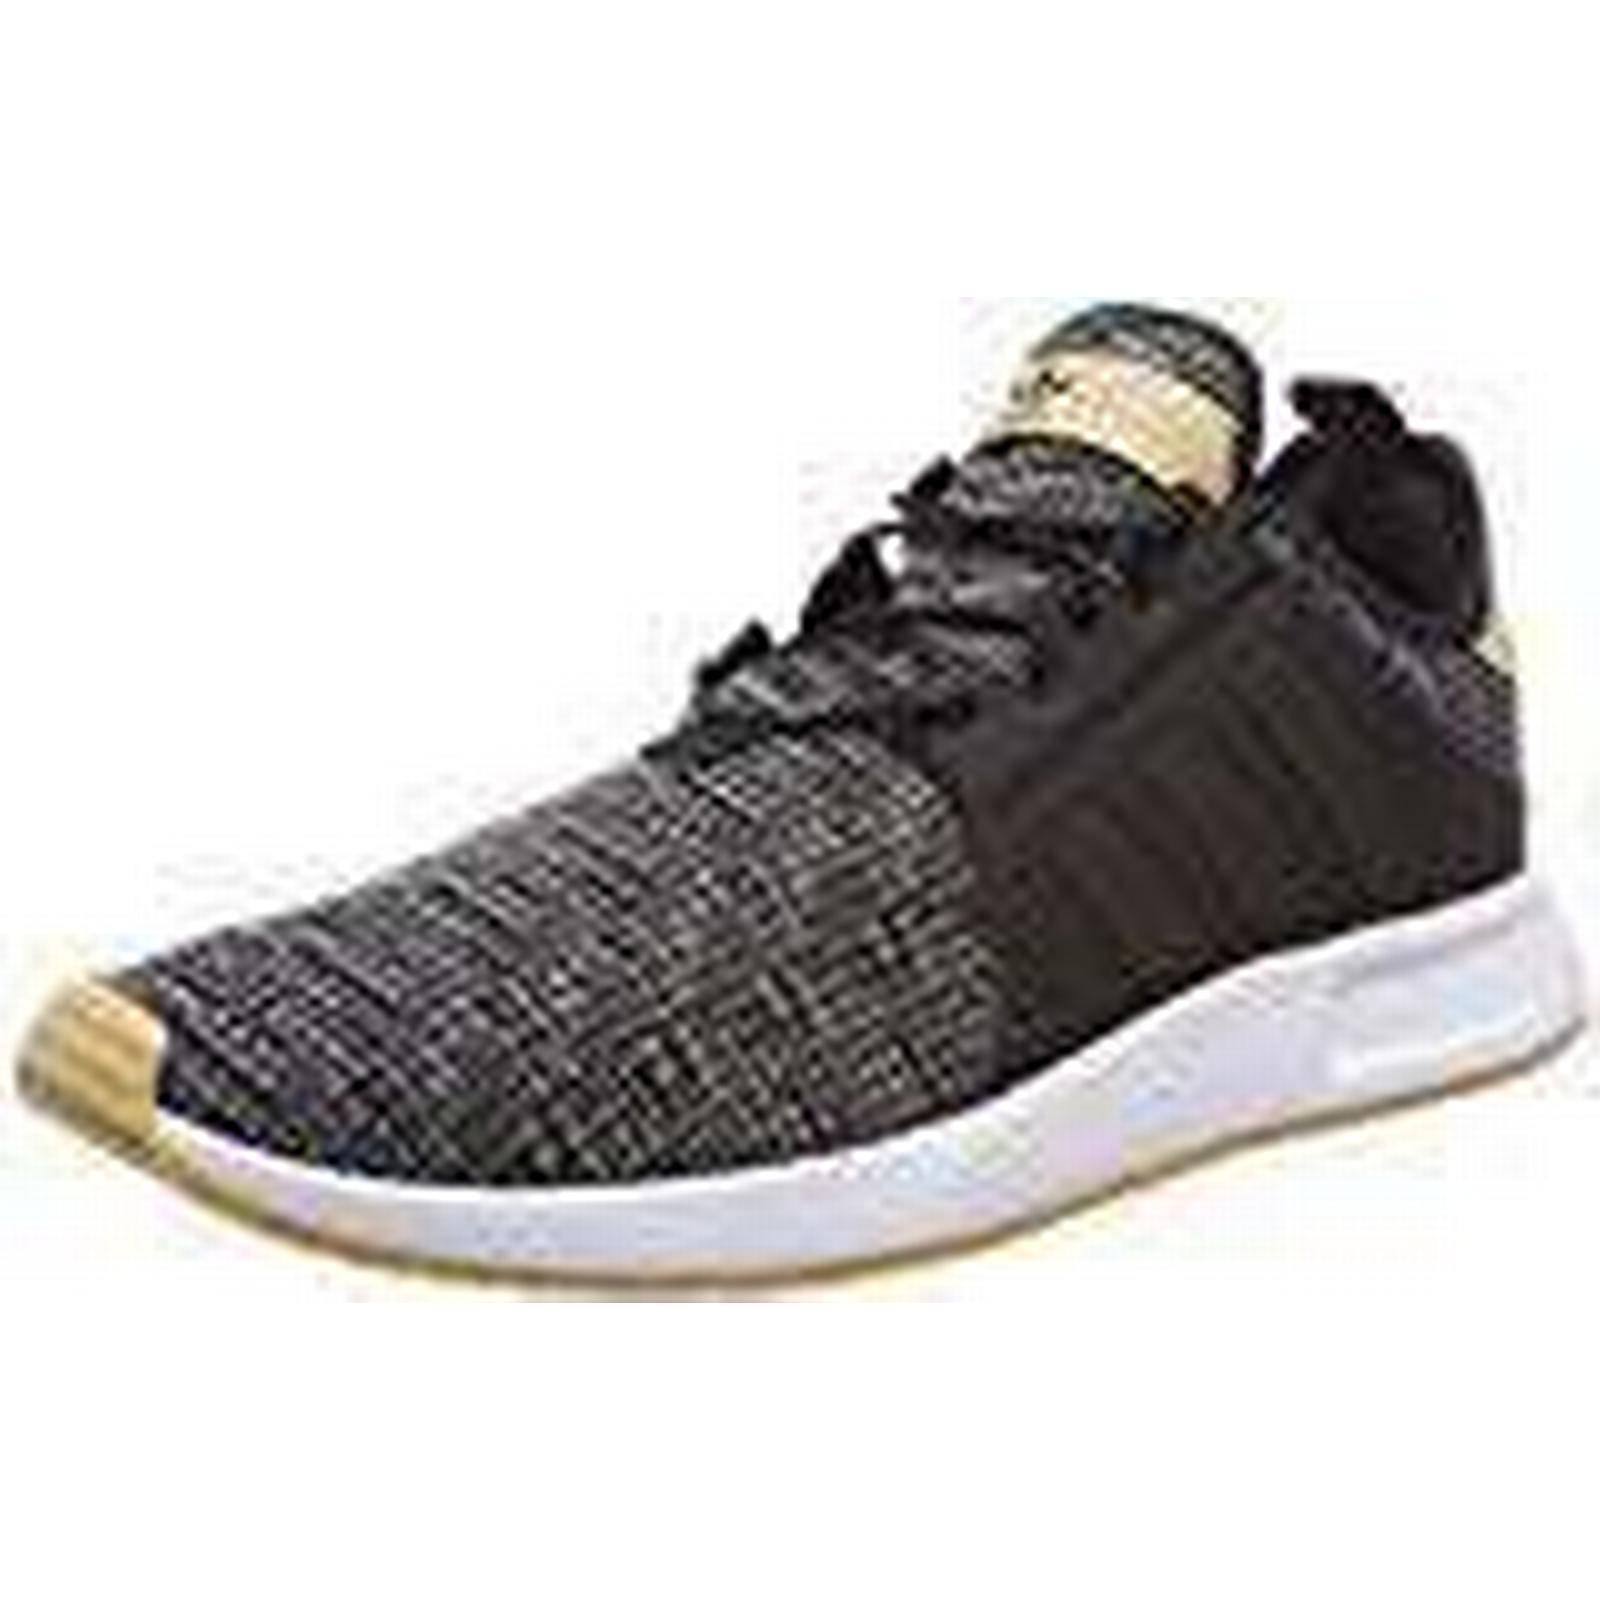 Adidas Black/Gum Originals Men's X_PLR Low-Top Sneakers, Black (Core Black/Core Black/Gum Adidas 3 001), 8.5 UK 34668b